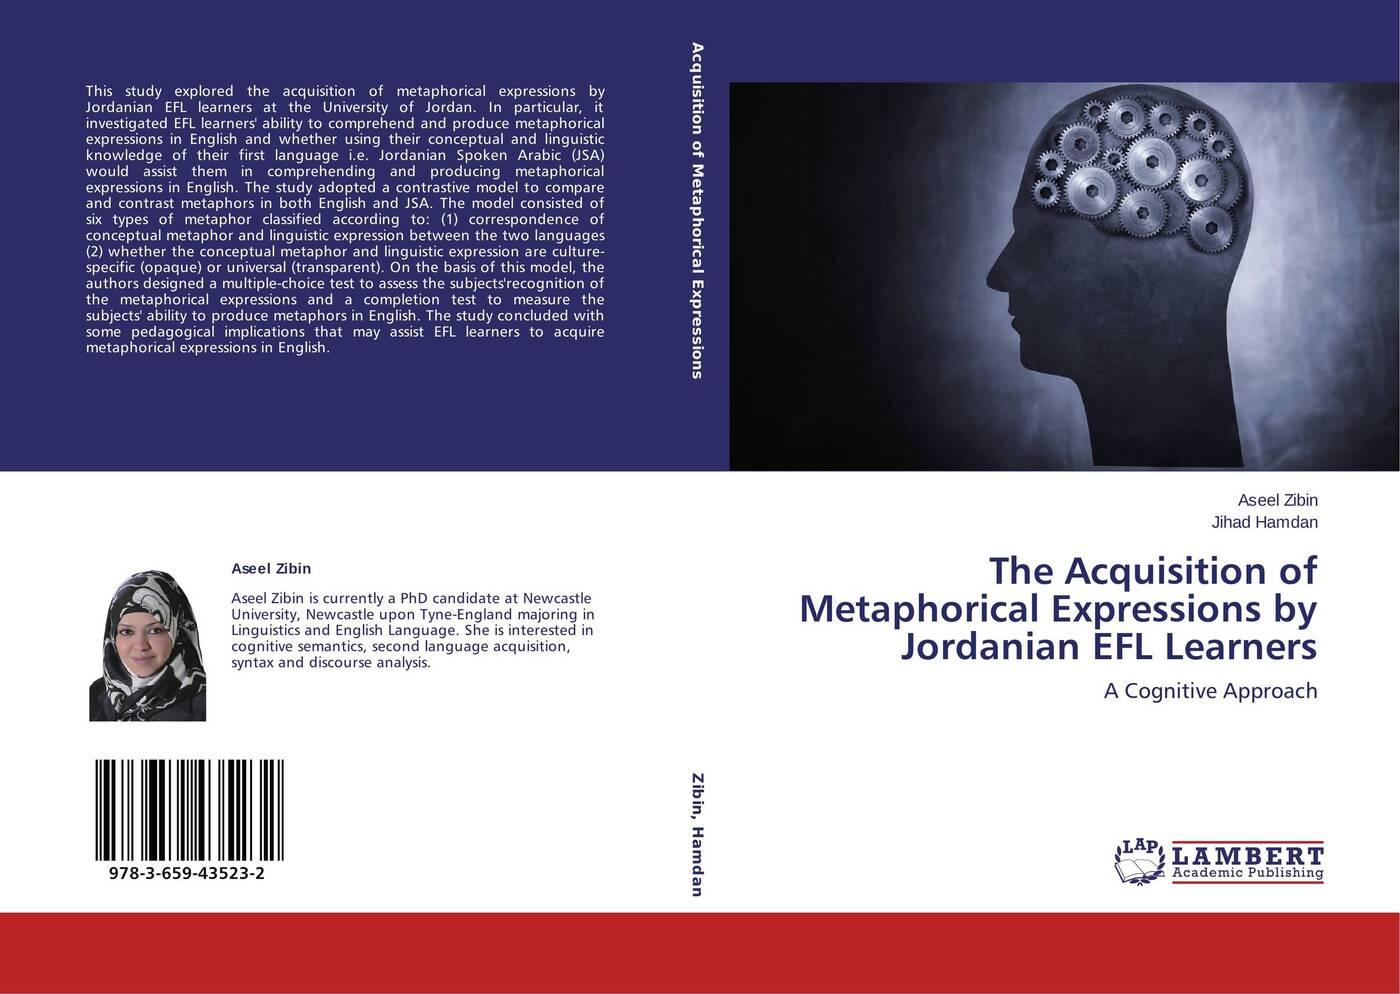 Aseel Zibin and Jihad Hamdan The Acquisition of Metaphorical Expressions by Jordanian EFL Learners цена в Москве и Питере